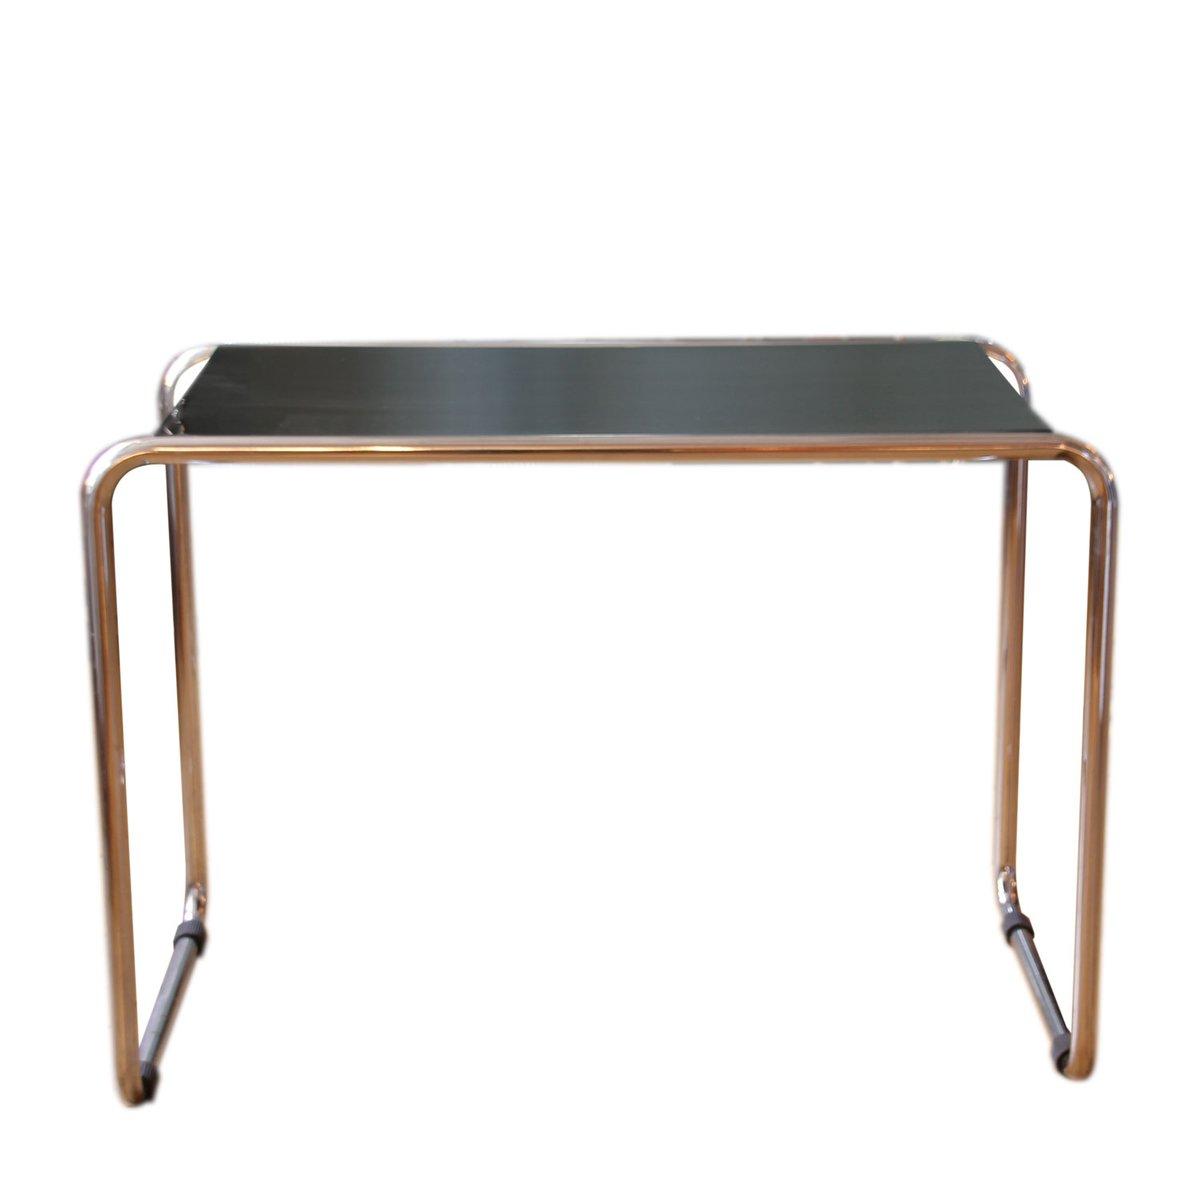 German Bauhaus Chromed Tubular Steel Laquered Wood Sidetable - Steel and wood side table